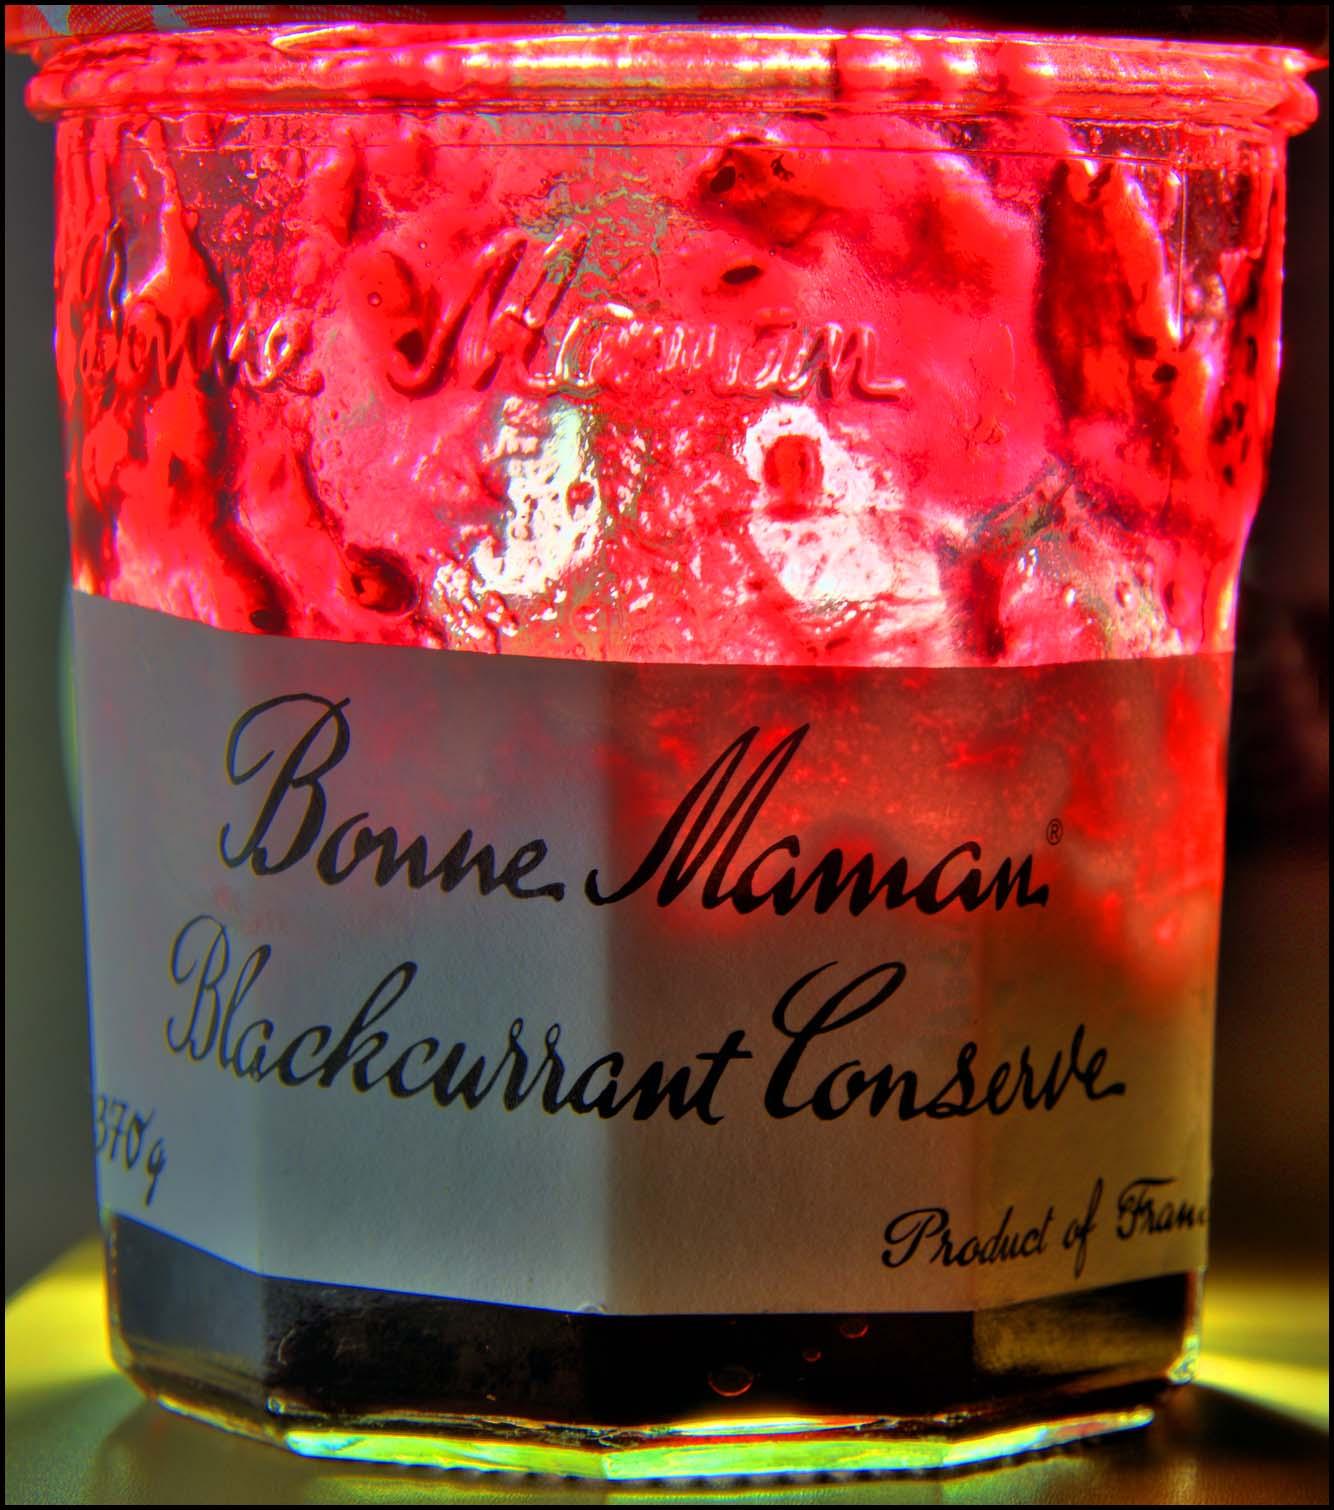 pot,jar,jam,jelly,red,conserve,Blackcurrent,black,current,frence,product,france,french,toast,spread,tony,smith,tonysmith,hotpix,hotpixuk,food,eat,eating,365days,photo,photos,photography,photographer,hotpix.org.uk,www.hotpix.org.uk